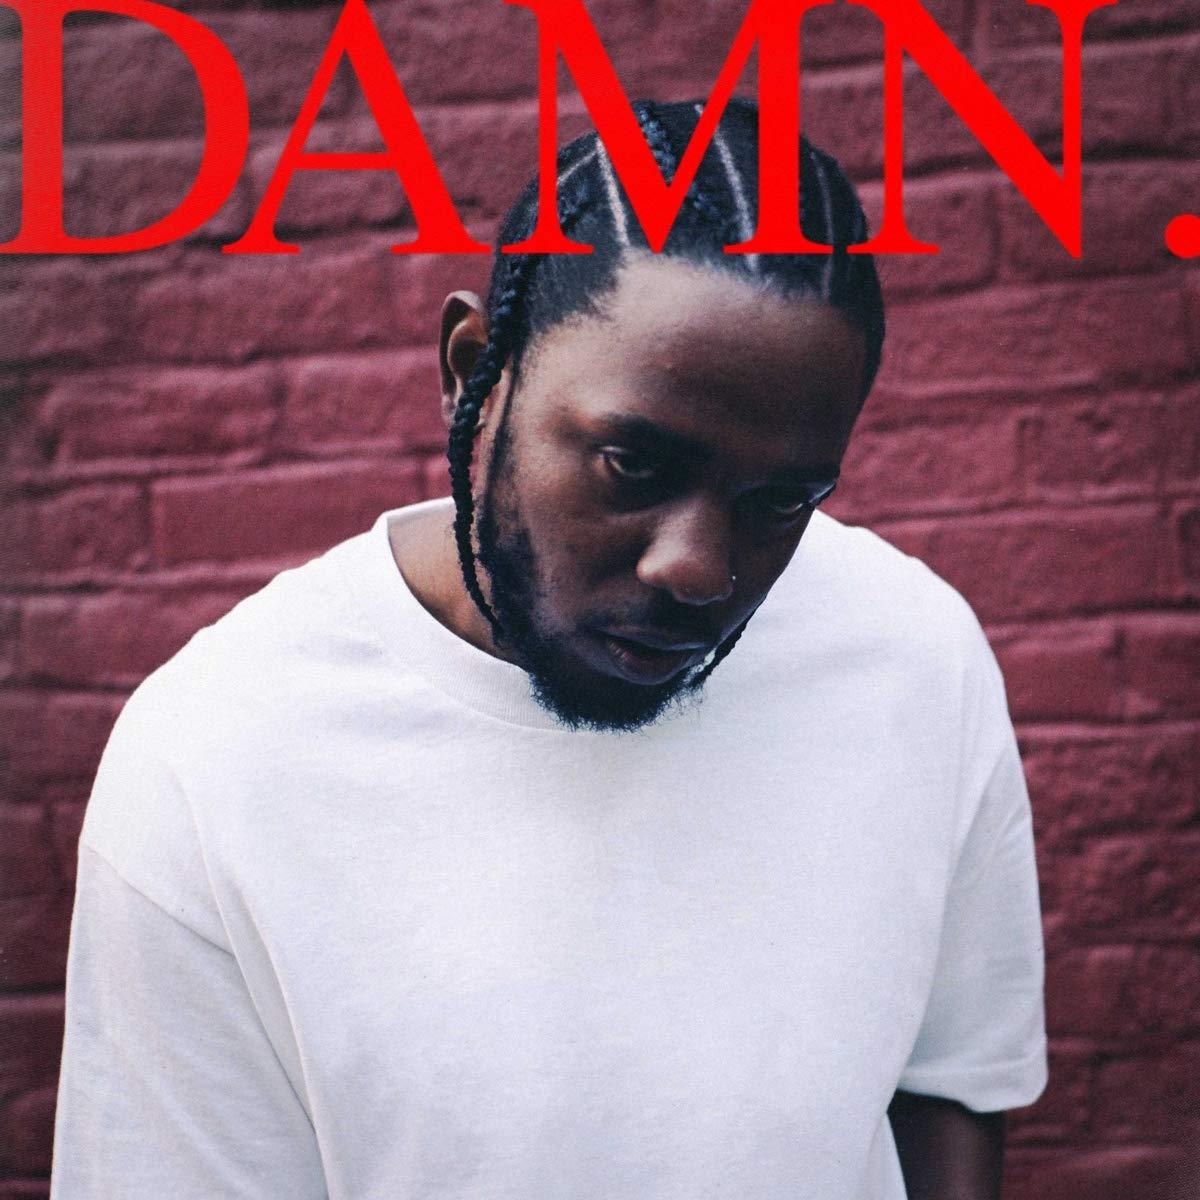 Released on April 14, 2017, Kendrick Lamar's fourth studio album